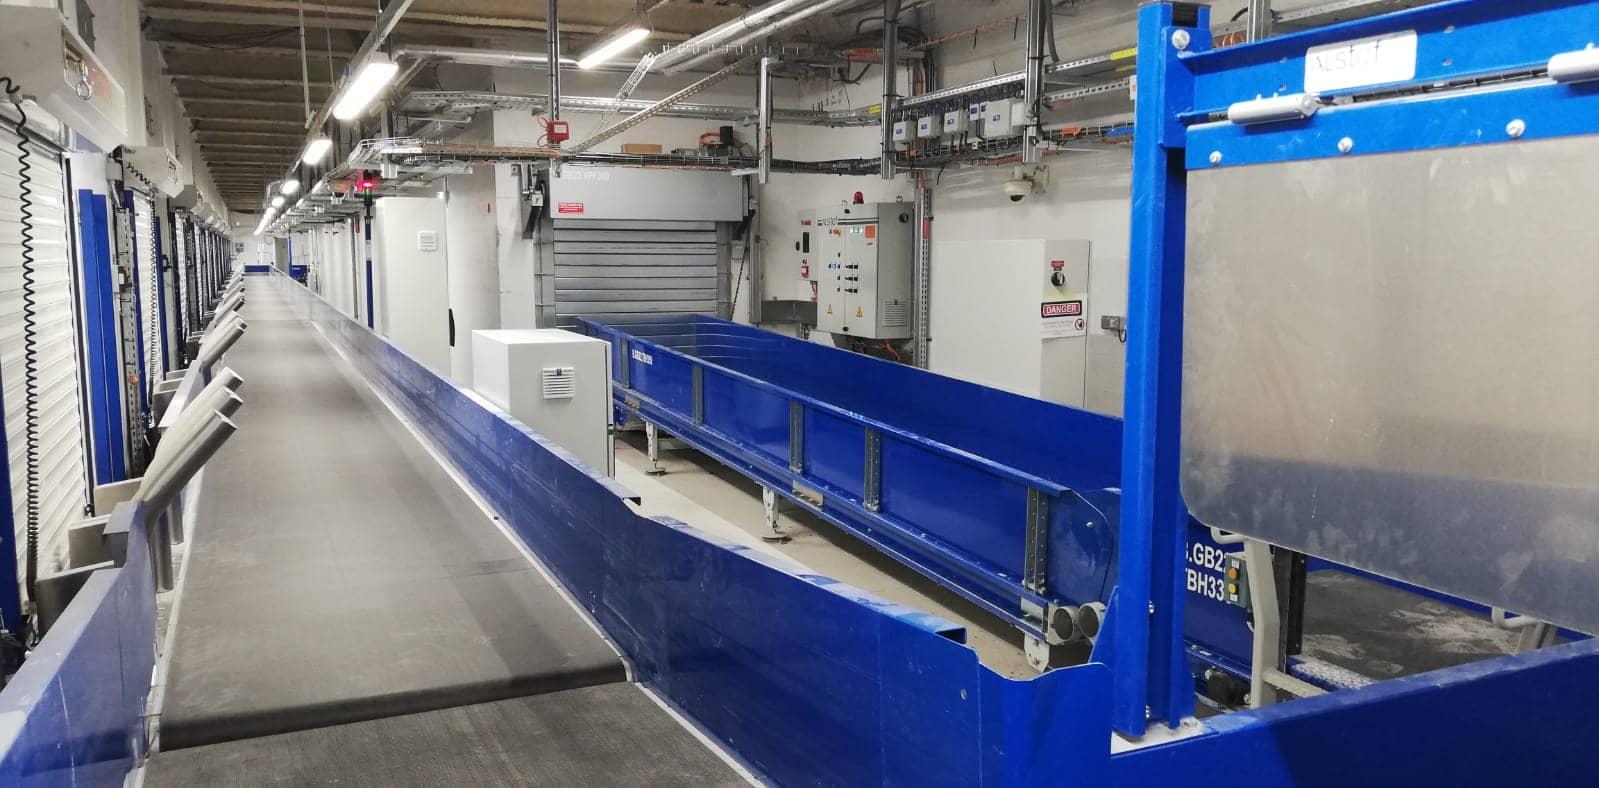 système de tri bagage BHS Baggage handling system